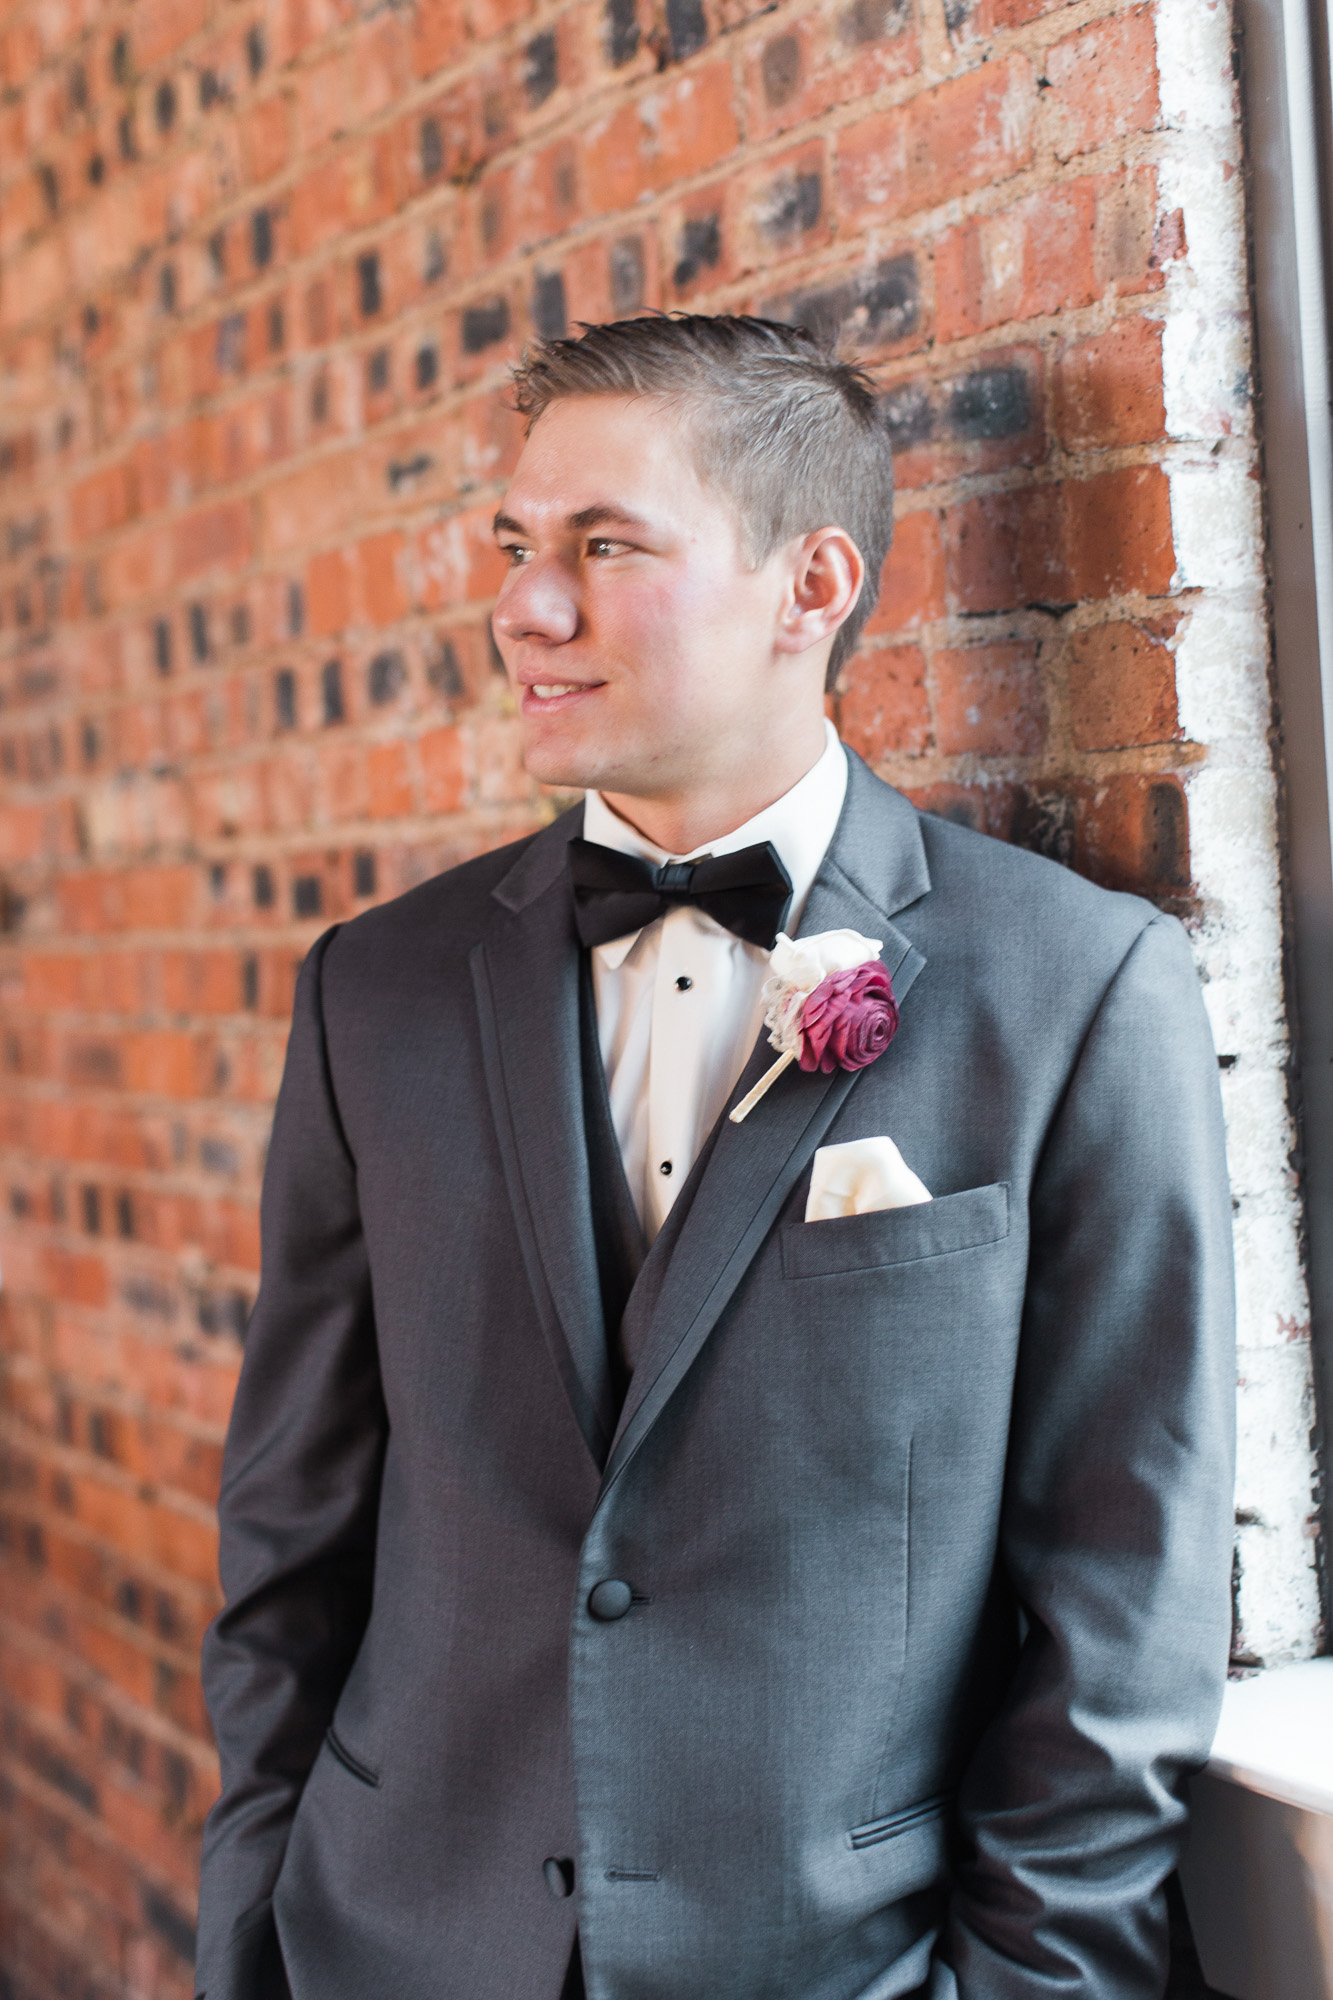 cdf6d-downtown-bryan-weddingdowntown-bryan-wedding.jpg